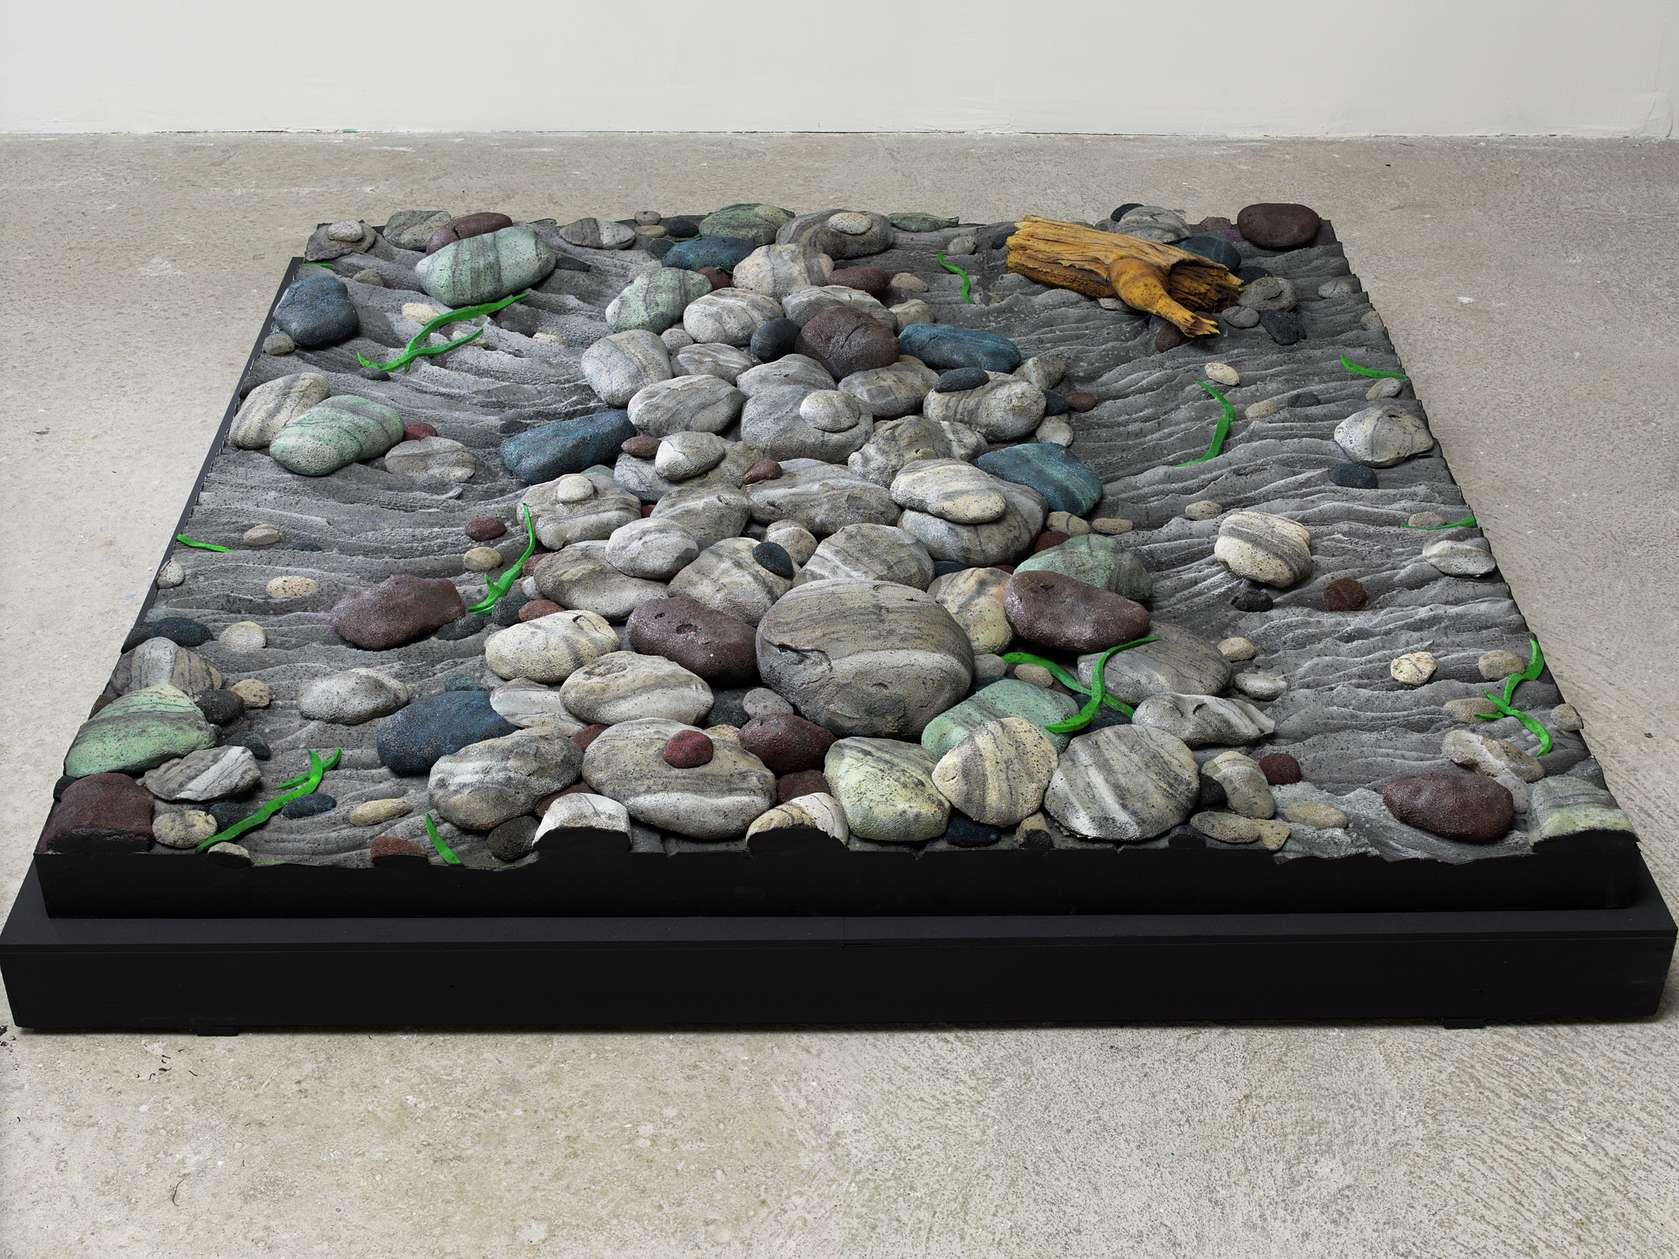 Piero Gilardi, Sassi, 1967 Mousse de polyuréthane152 × 152 × 18 cm / 59 7/8 × 59 7/8 × 7 1/8 in.